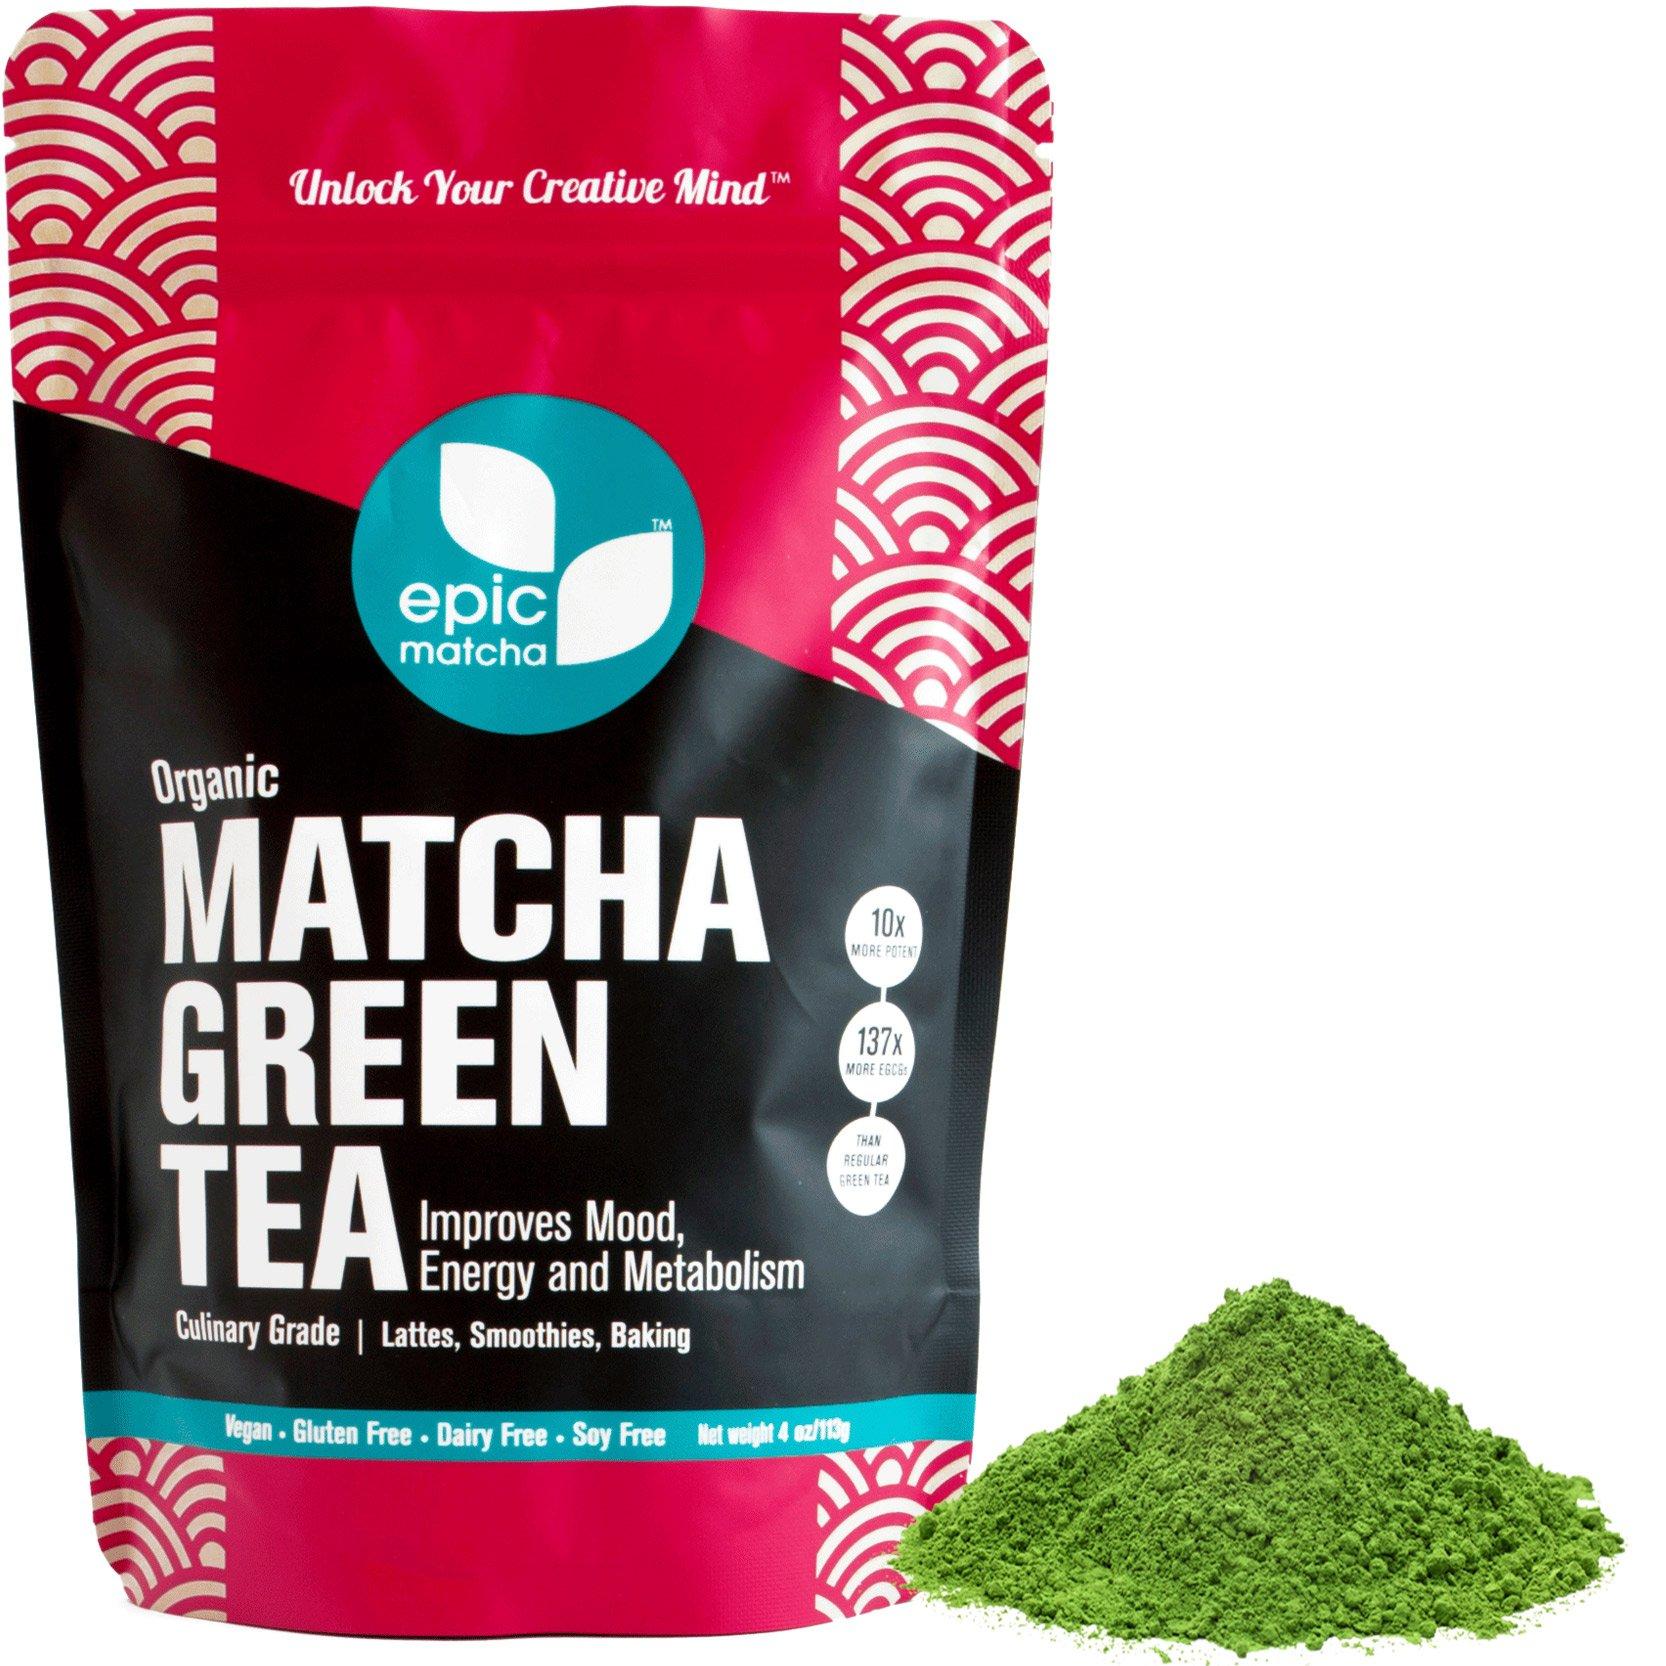 Epic Matcha Organic Matcha Green Tea Powder - 4oz/113g (48 servings) - Culinary Grade, Non-GMO, Vegan, Unsweetened by Epic Matcha